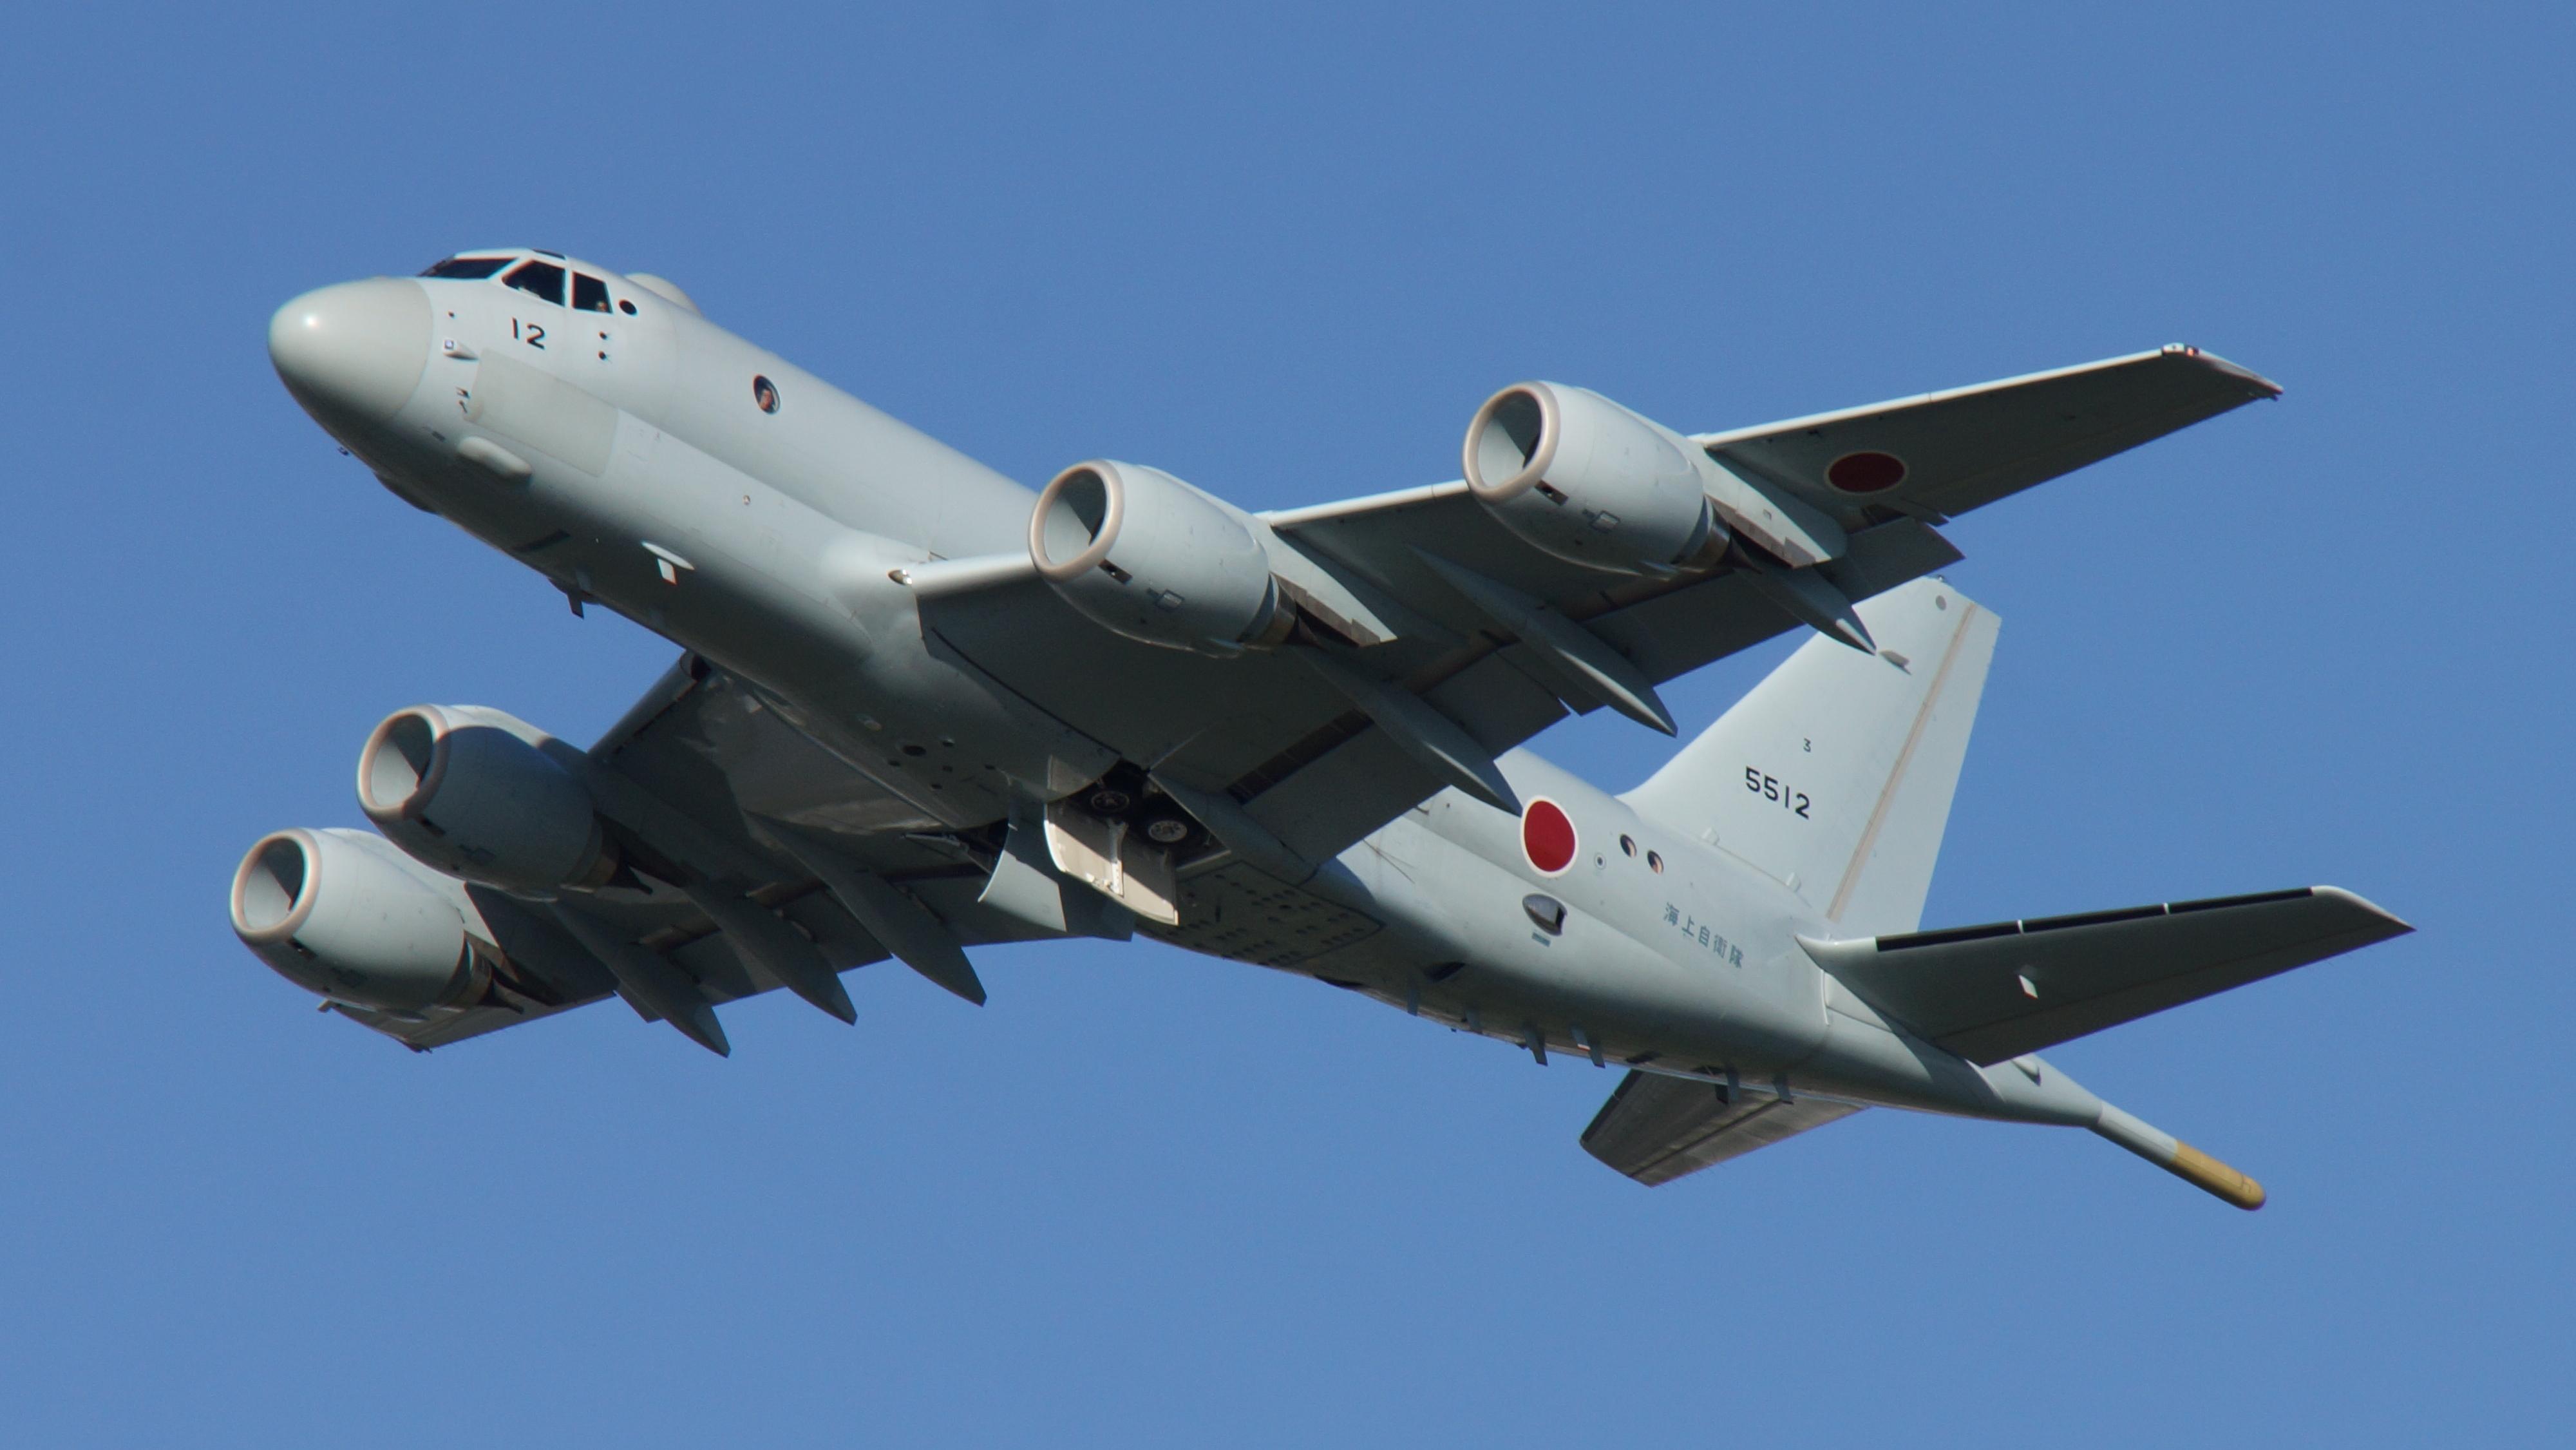 JMSDF_P-1%285512%29_fly_over_at_Tokushima_Air_Base_September_30%2C_2017_03.jpg